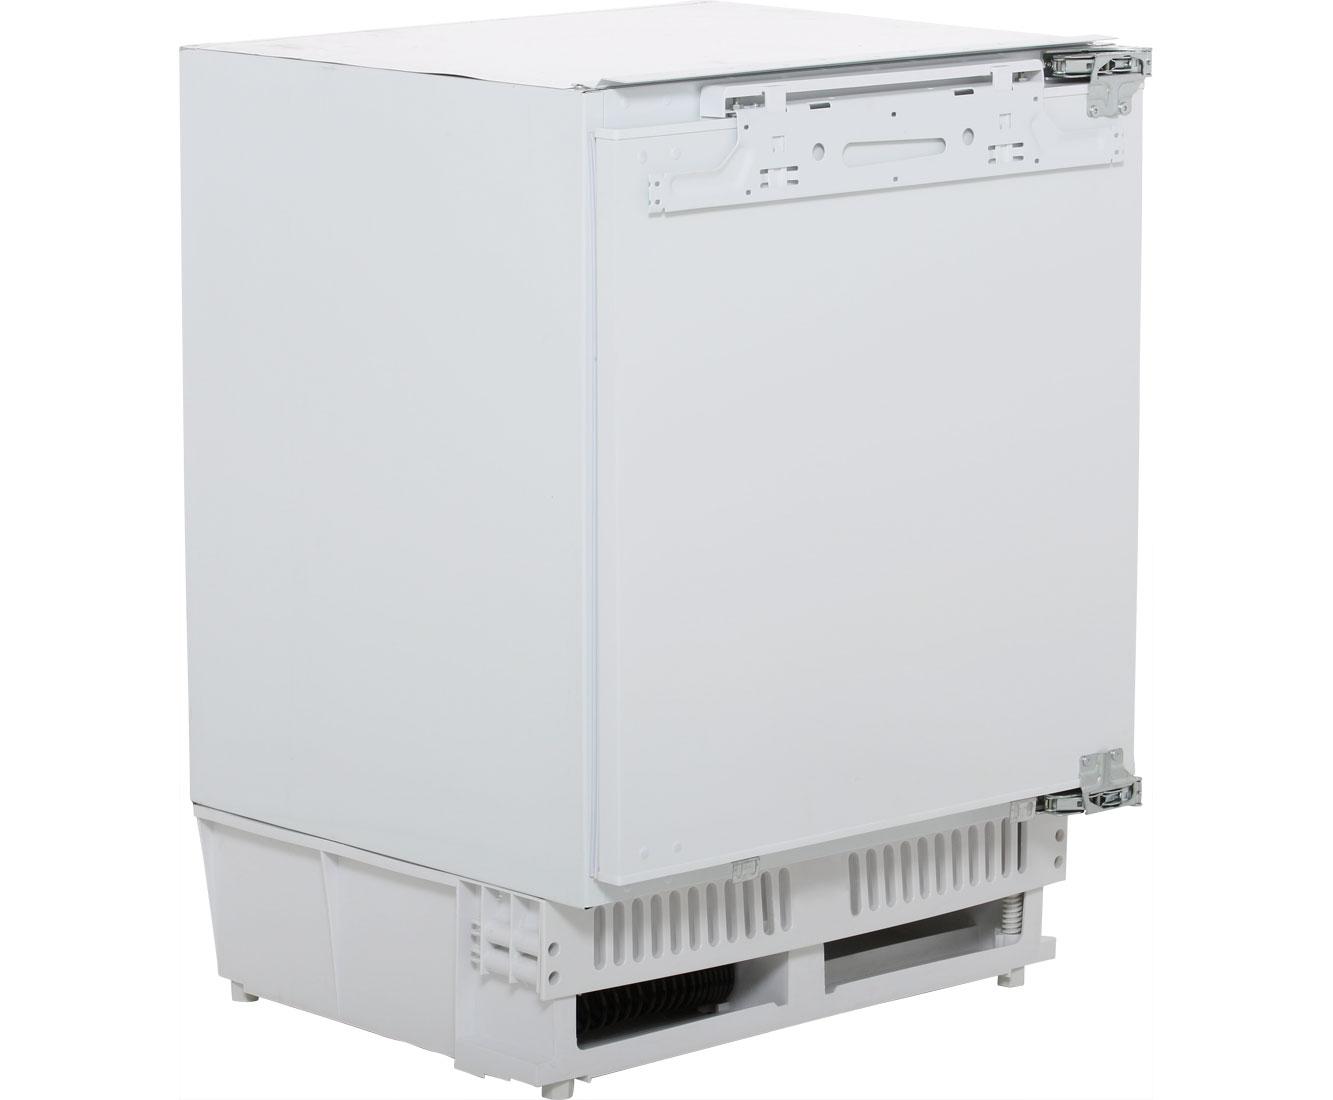 Amica Kühlschrank Uvks 16149 : Amica uvks kühlschrank unterbau cm weiss neu ebay